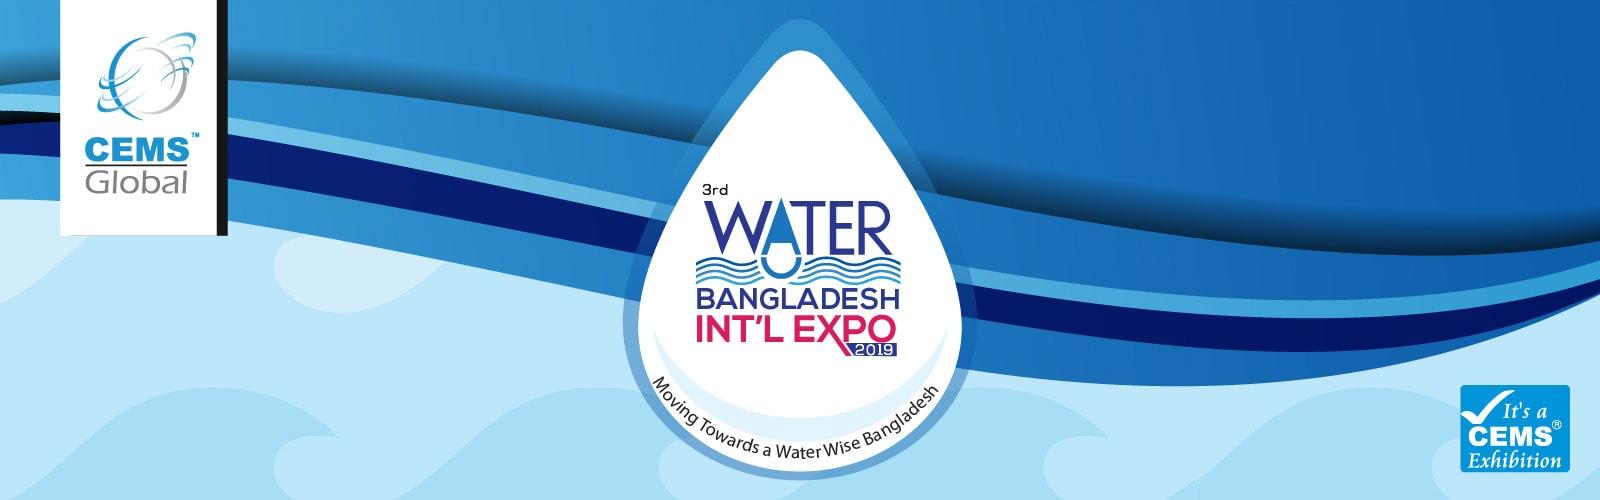 3rd Water Bangladesh International Expo 2019